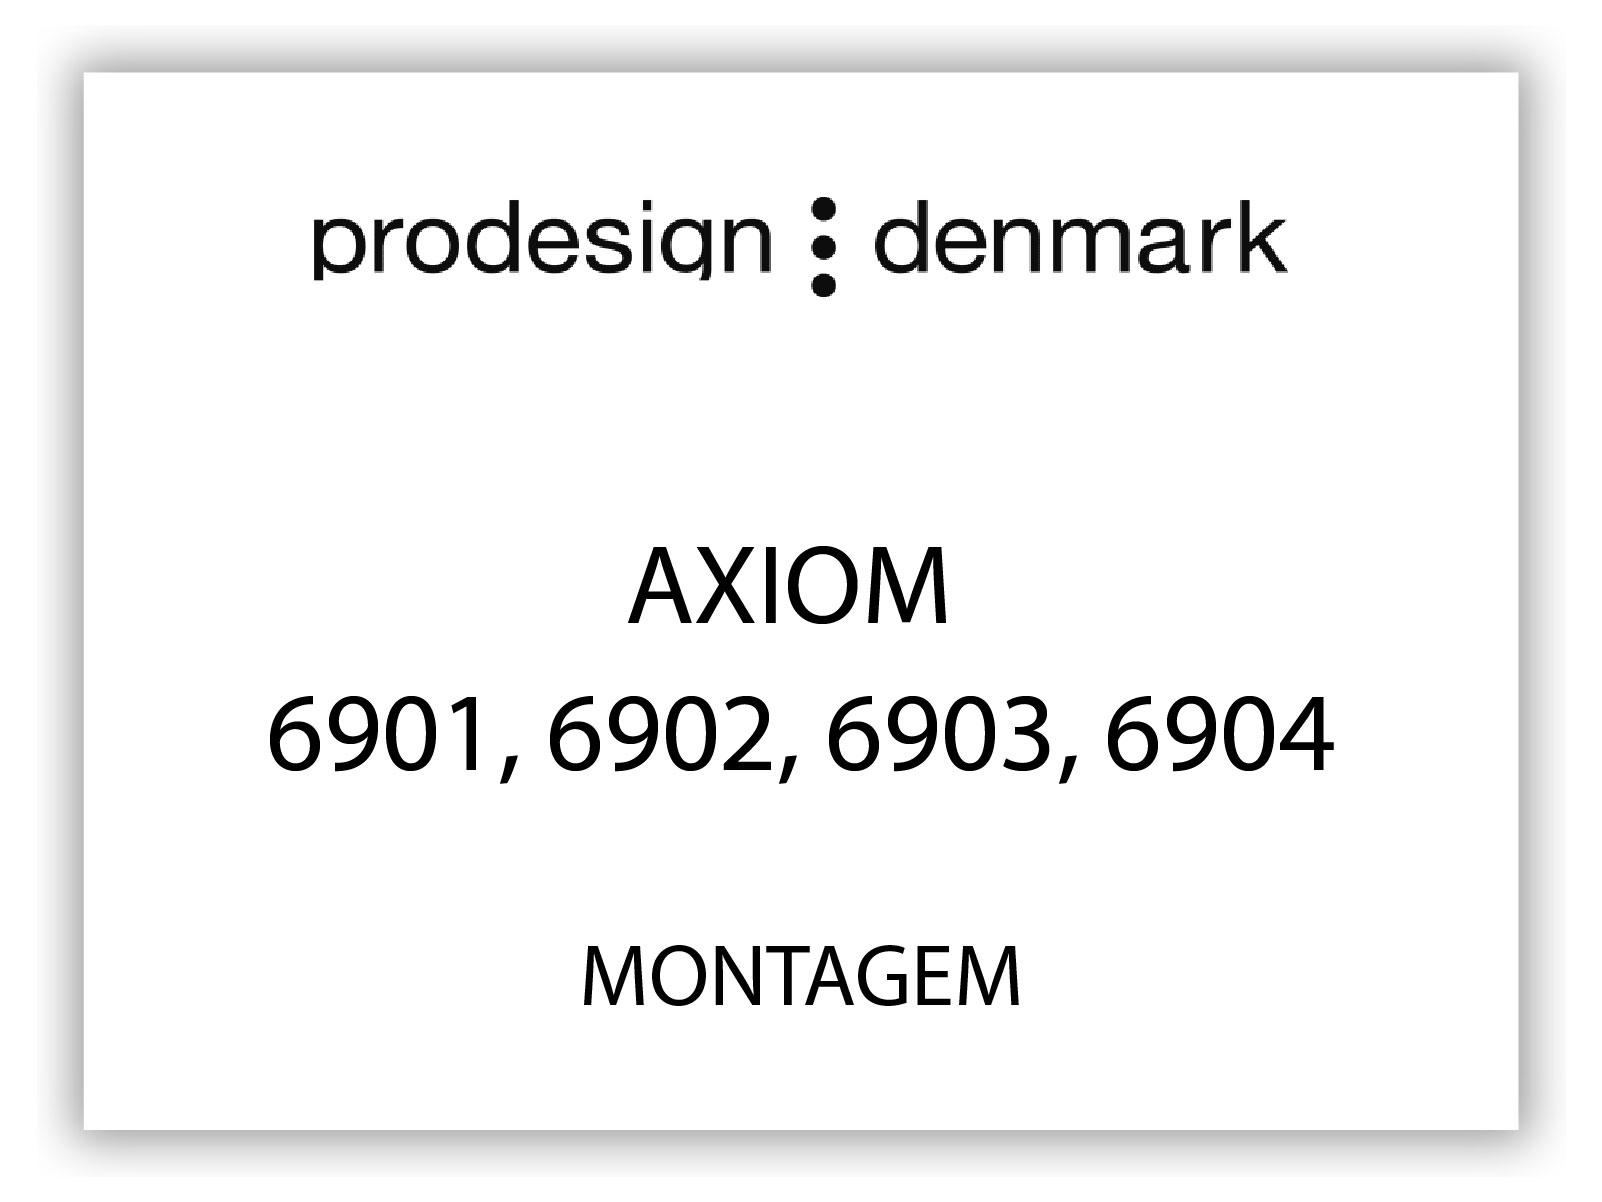 ProDesignDenamark_capa-AXIOM 6901, 6902, 6903, 6904-mont